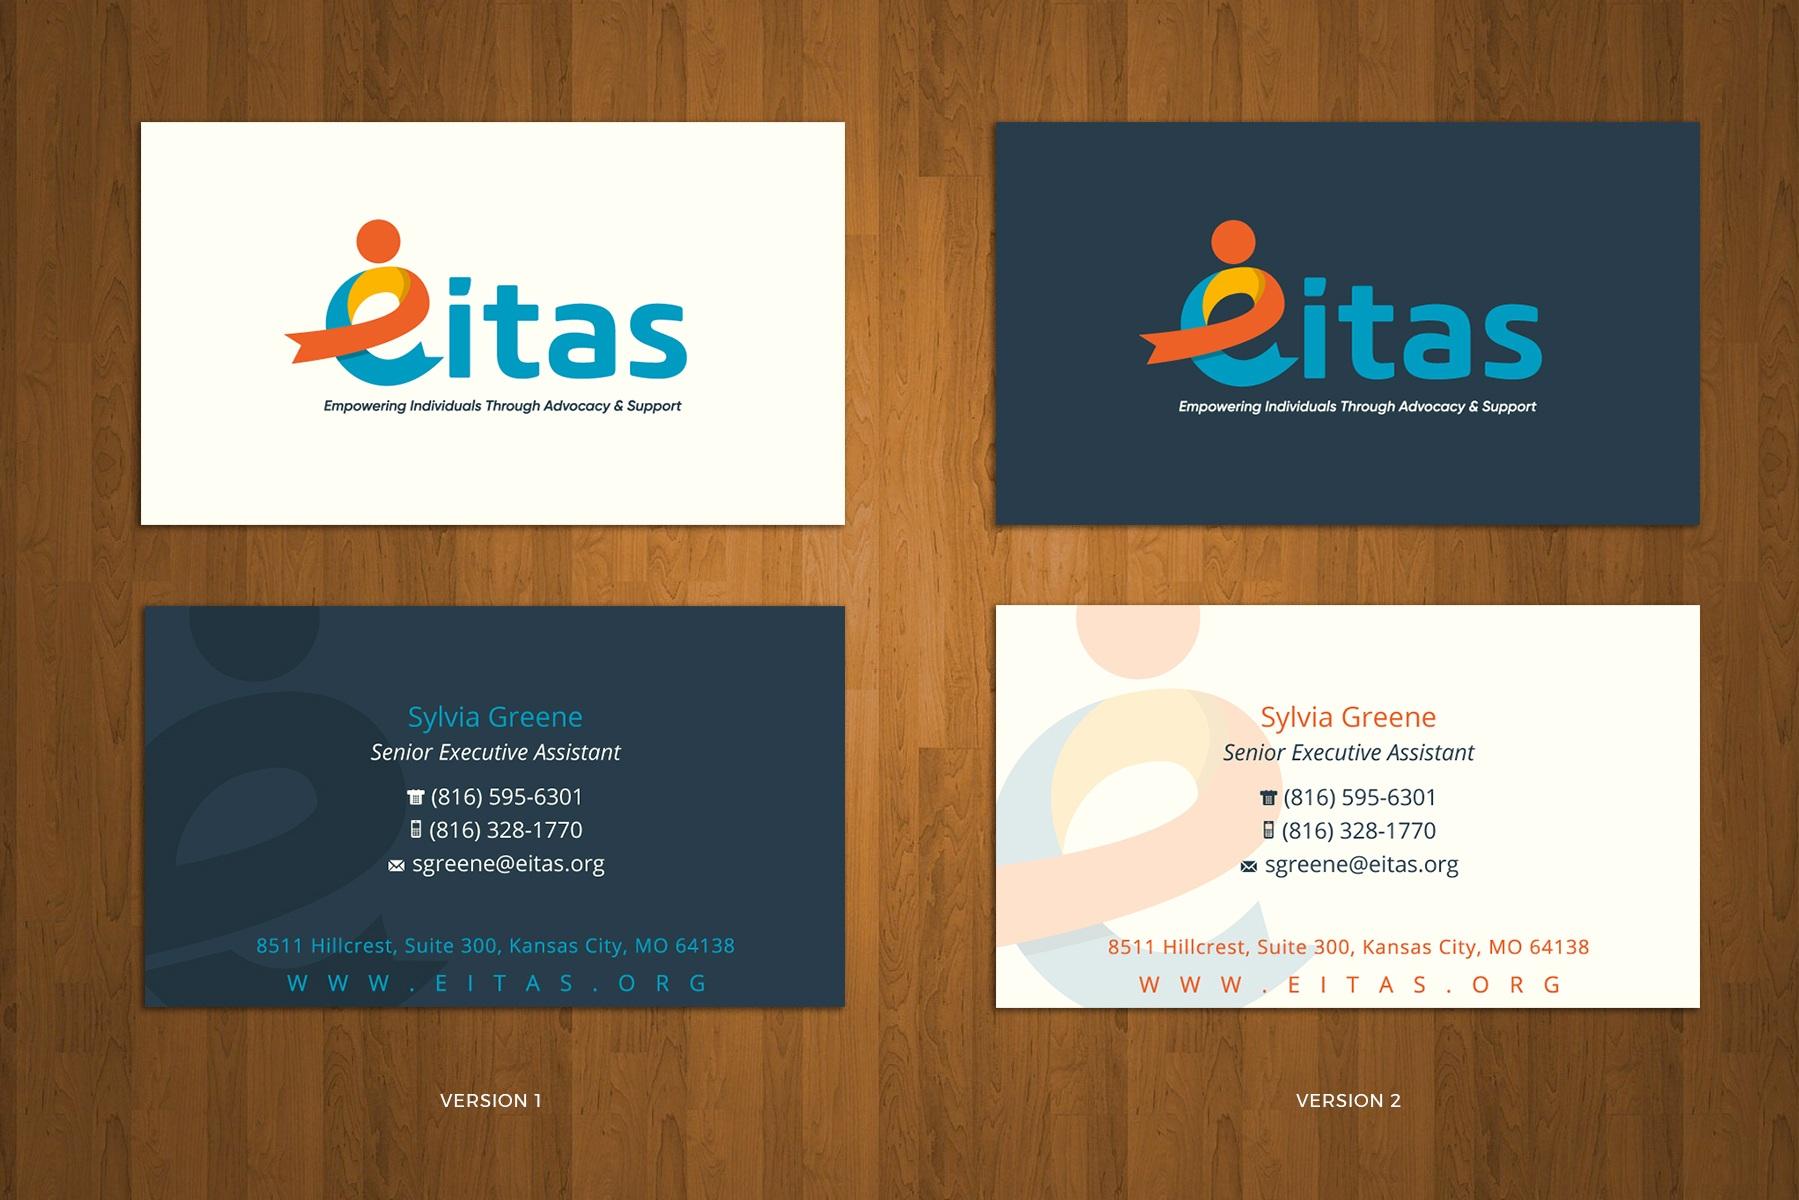 Eitas-Business Card Options.jpg